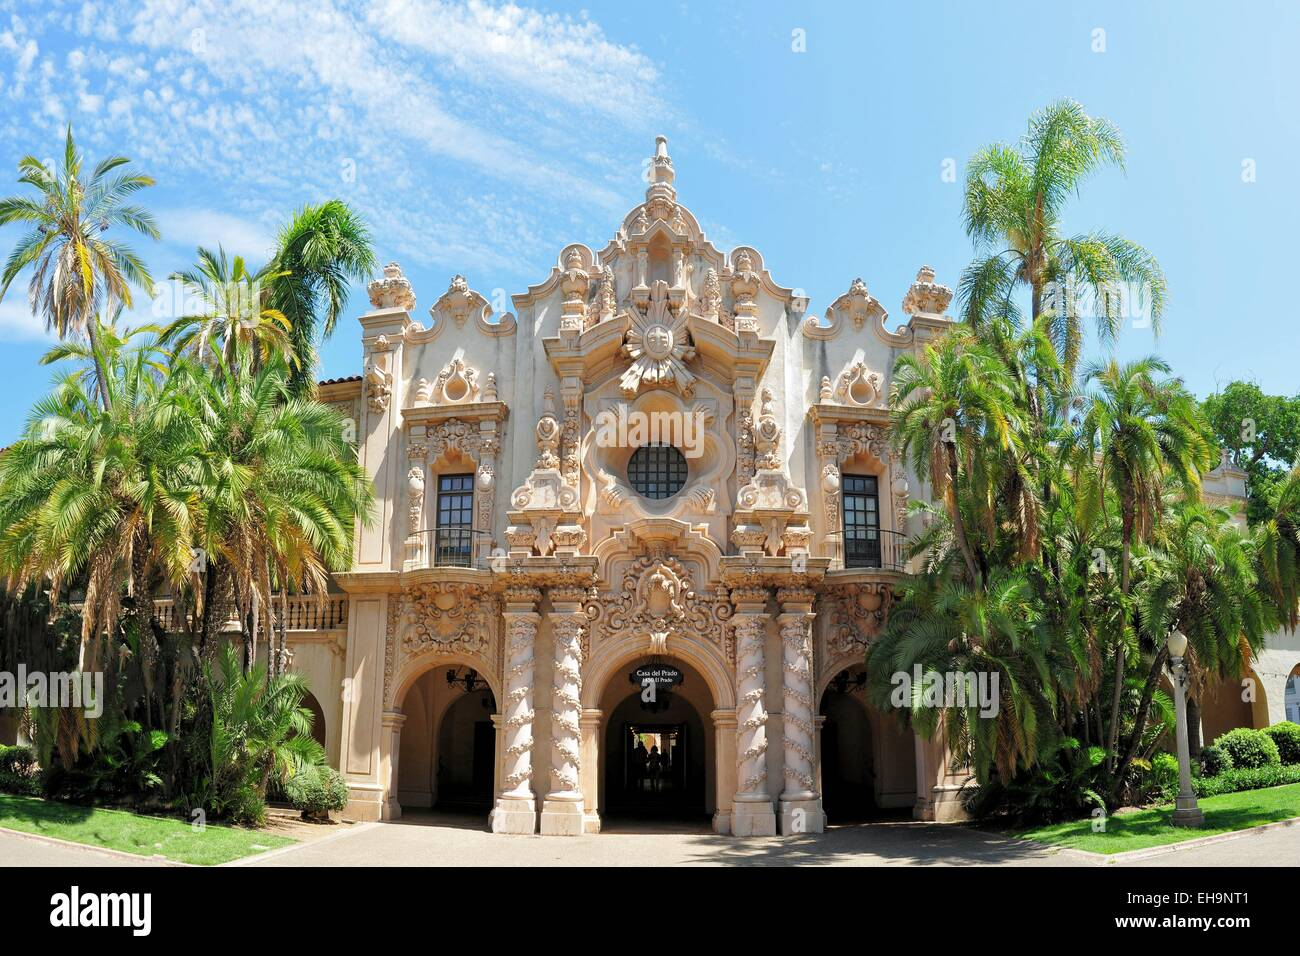 Spanish architecture Balboa park San Diego California Stock Photo